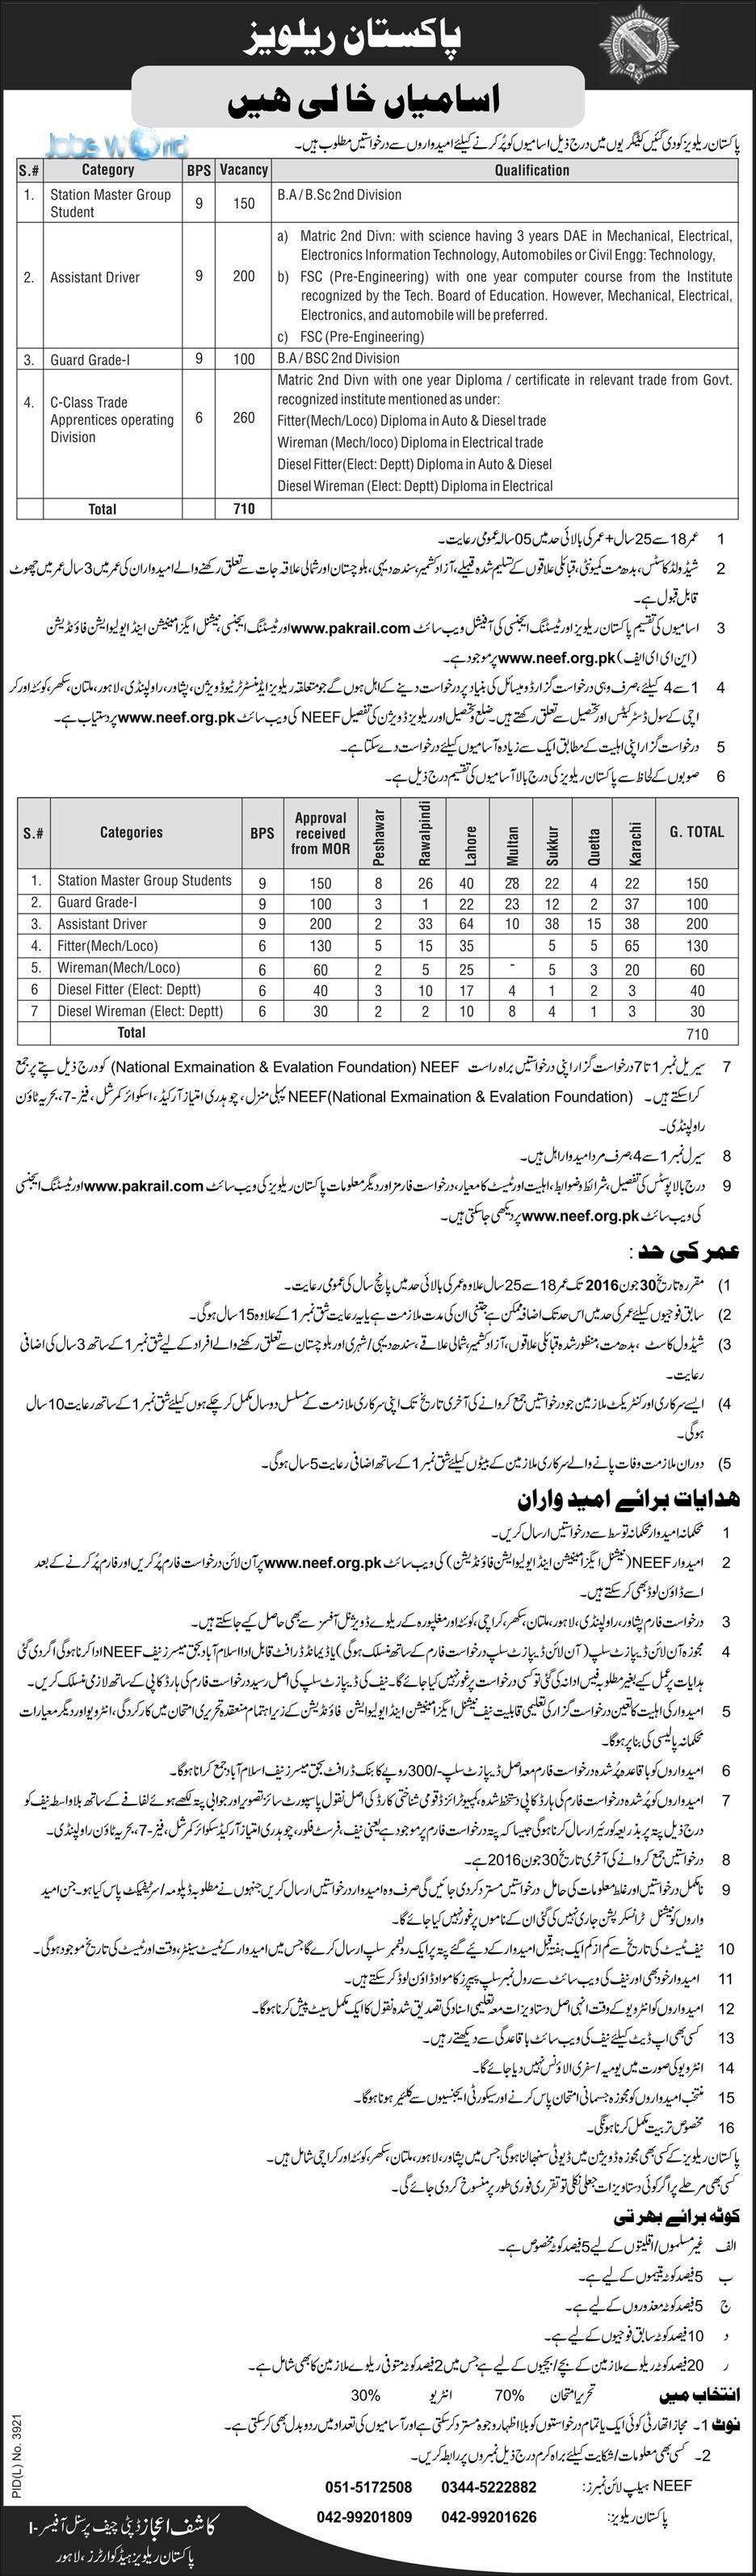 railways jobs 2016 online application form jobsworld railways jobs 2016 online application form